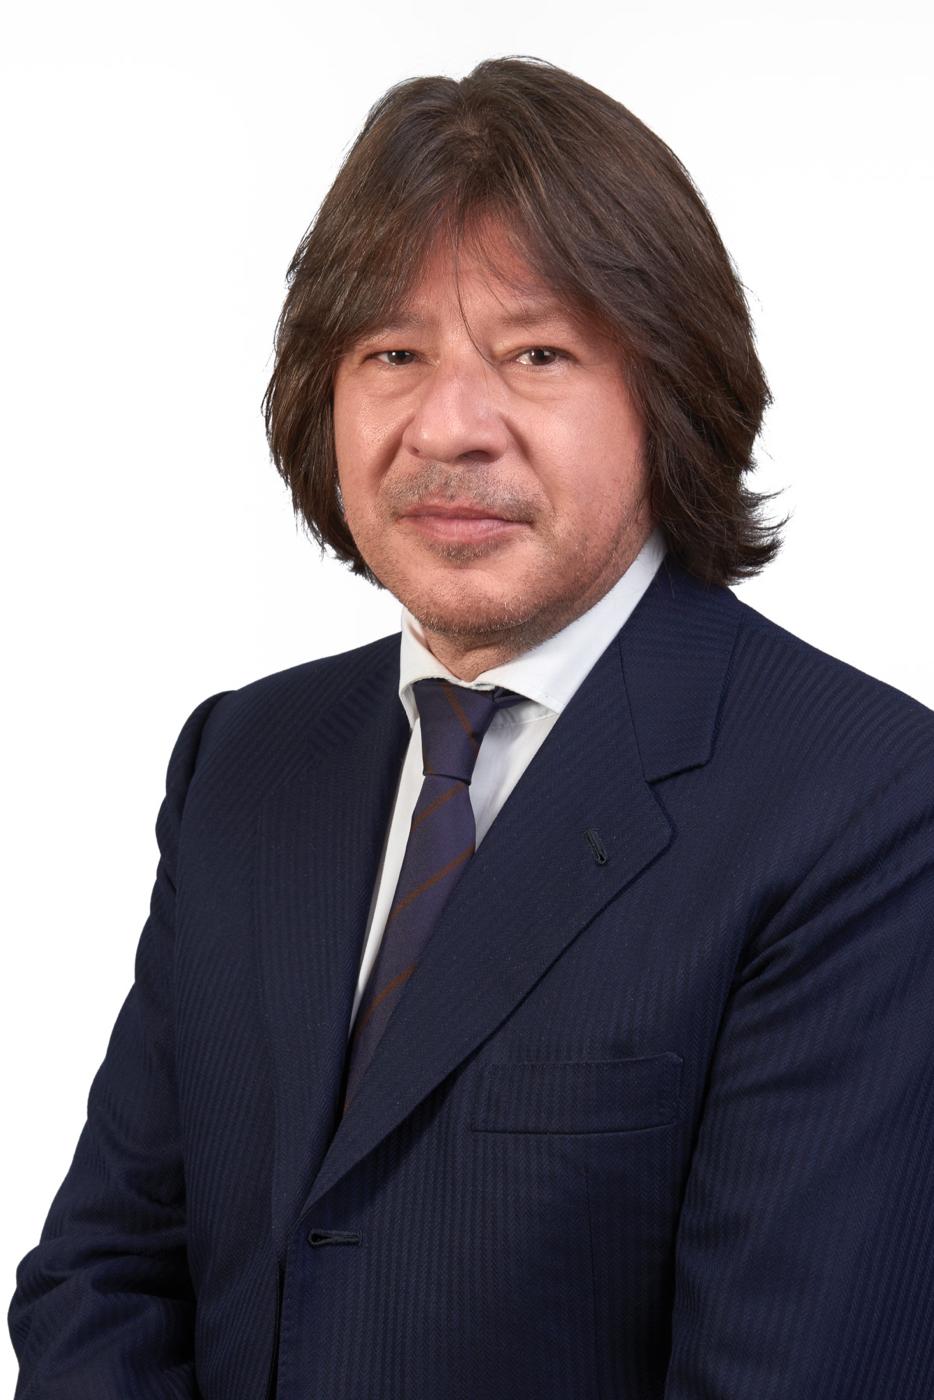 Giancarlo Maura